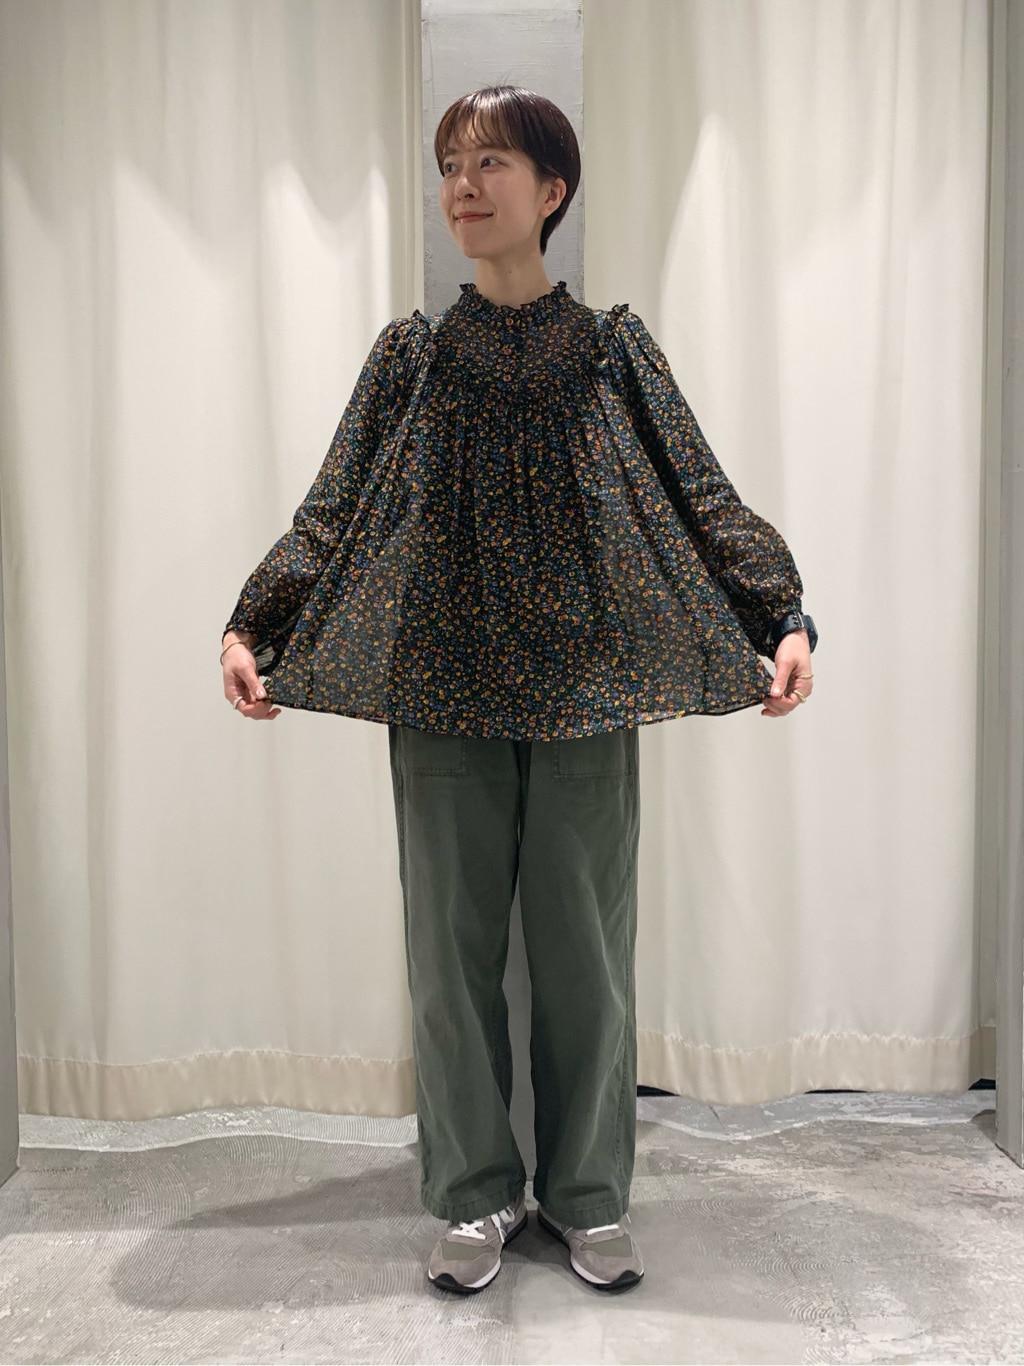 - CHILD WOMAN CHILD WOMAN , PAR ICI ルミネ横浜 身長:158cm 2021.03.19